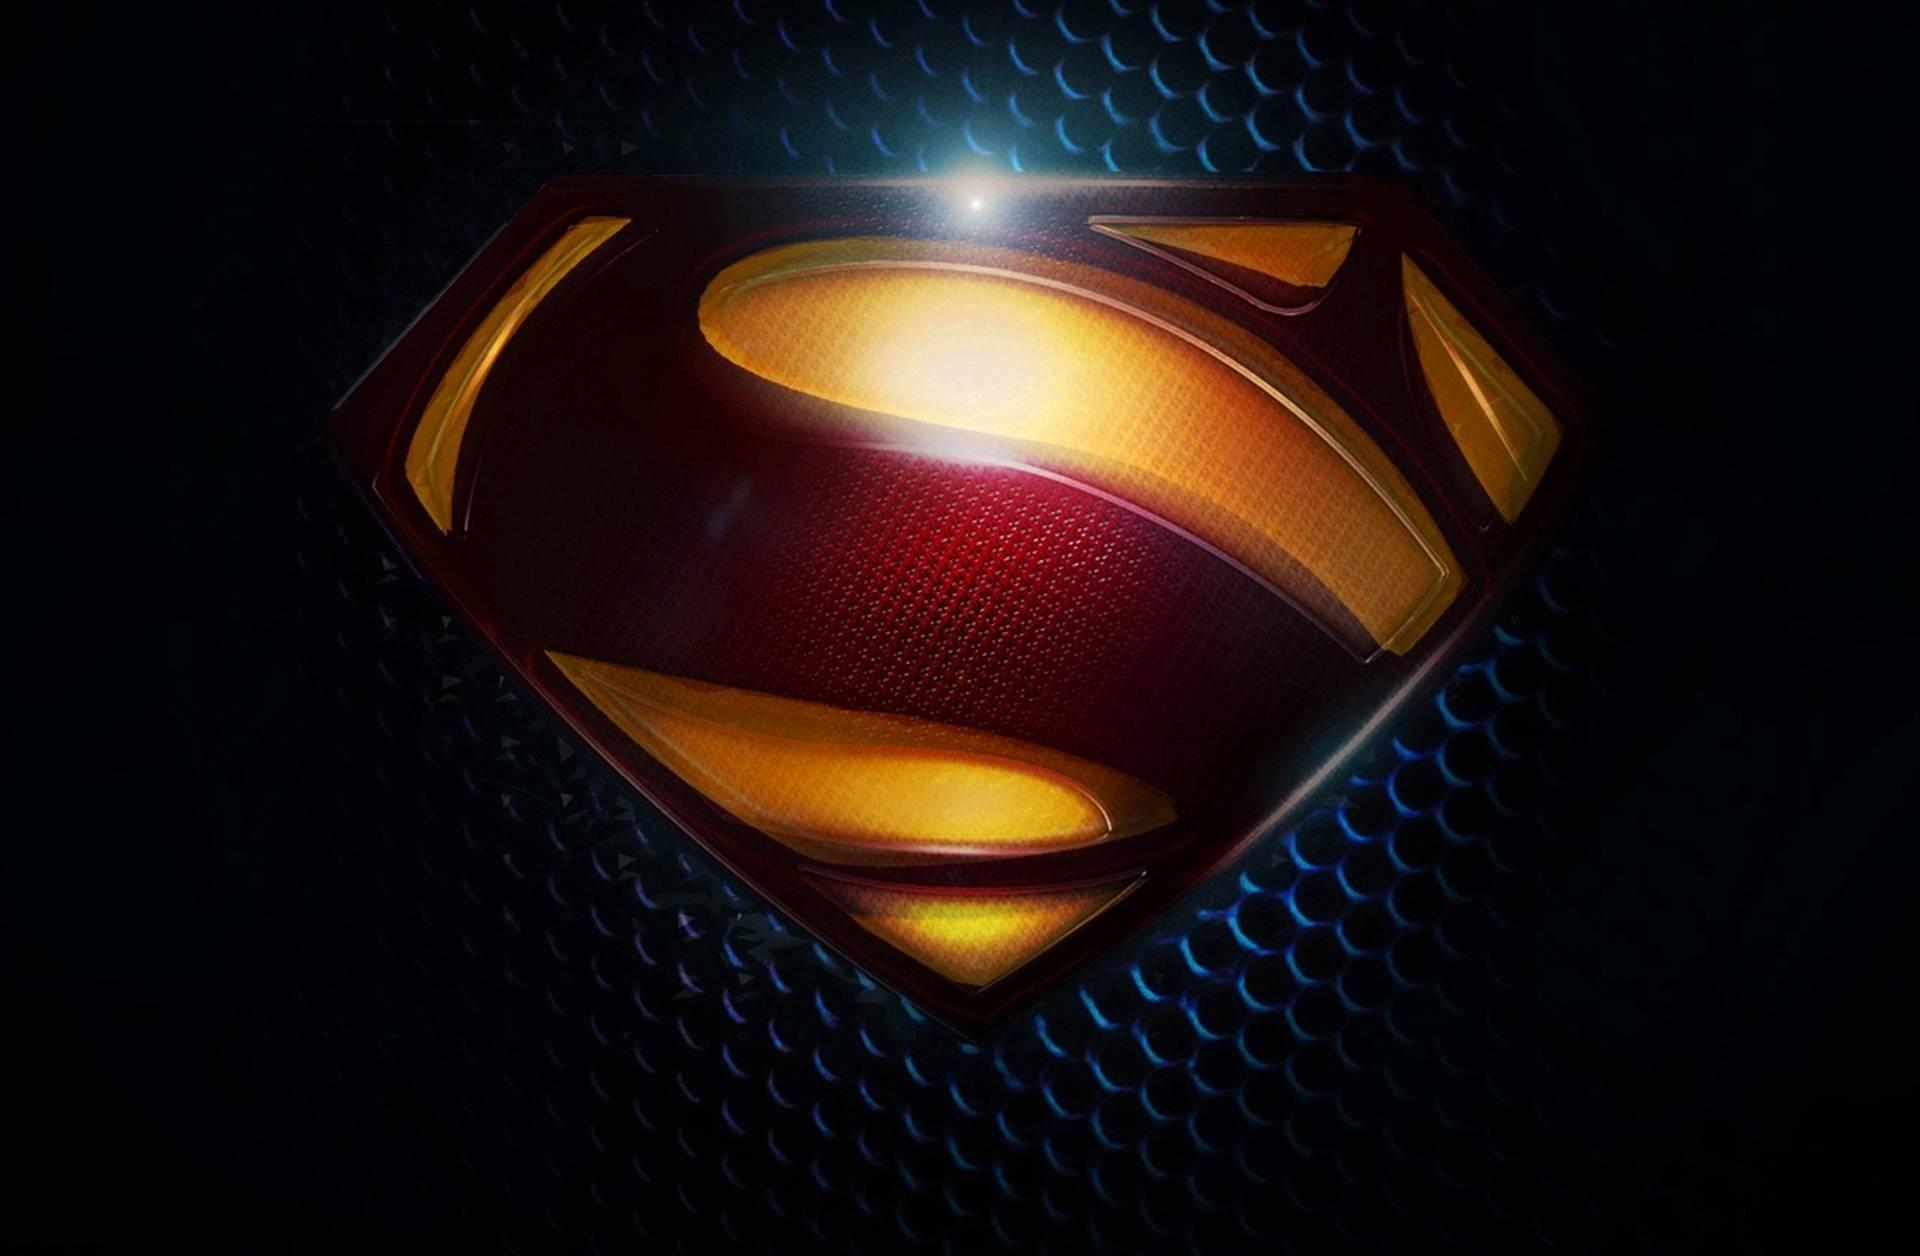 Superman Desktop Wallpaper – Widescreen HD Wallpapers